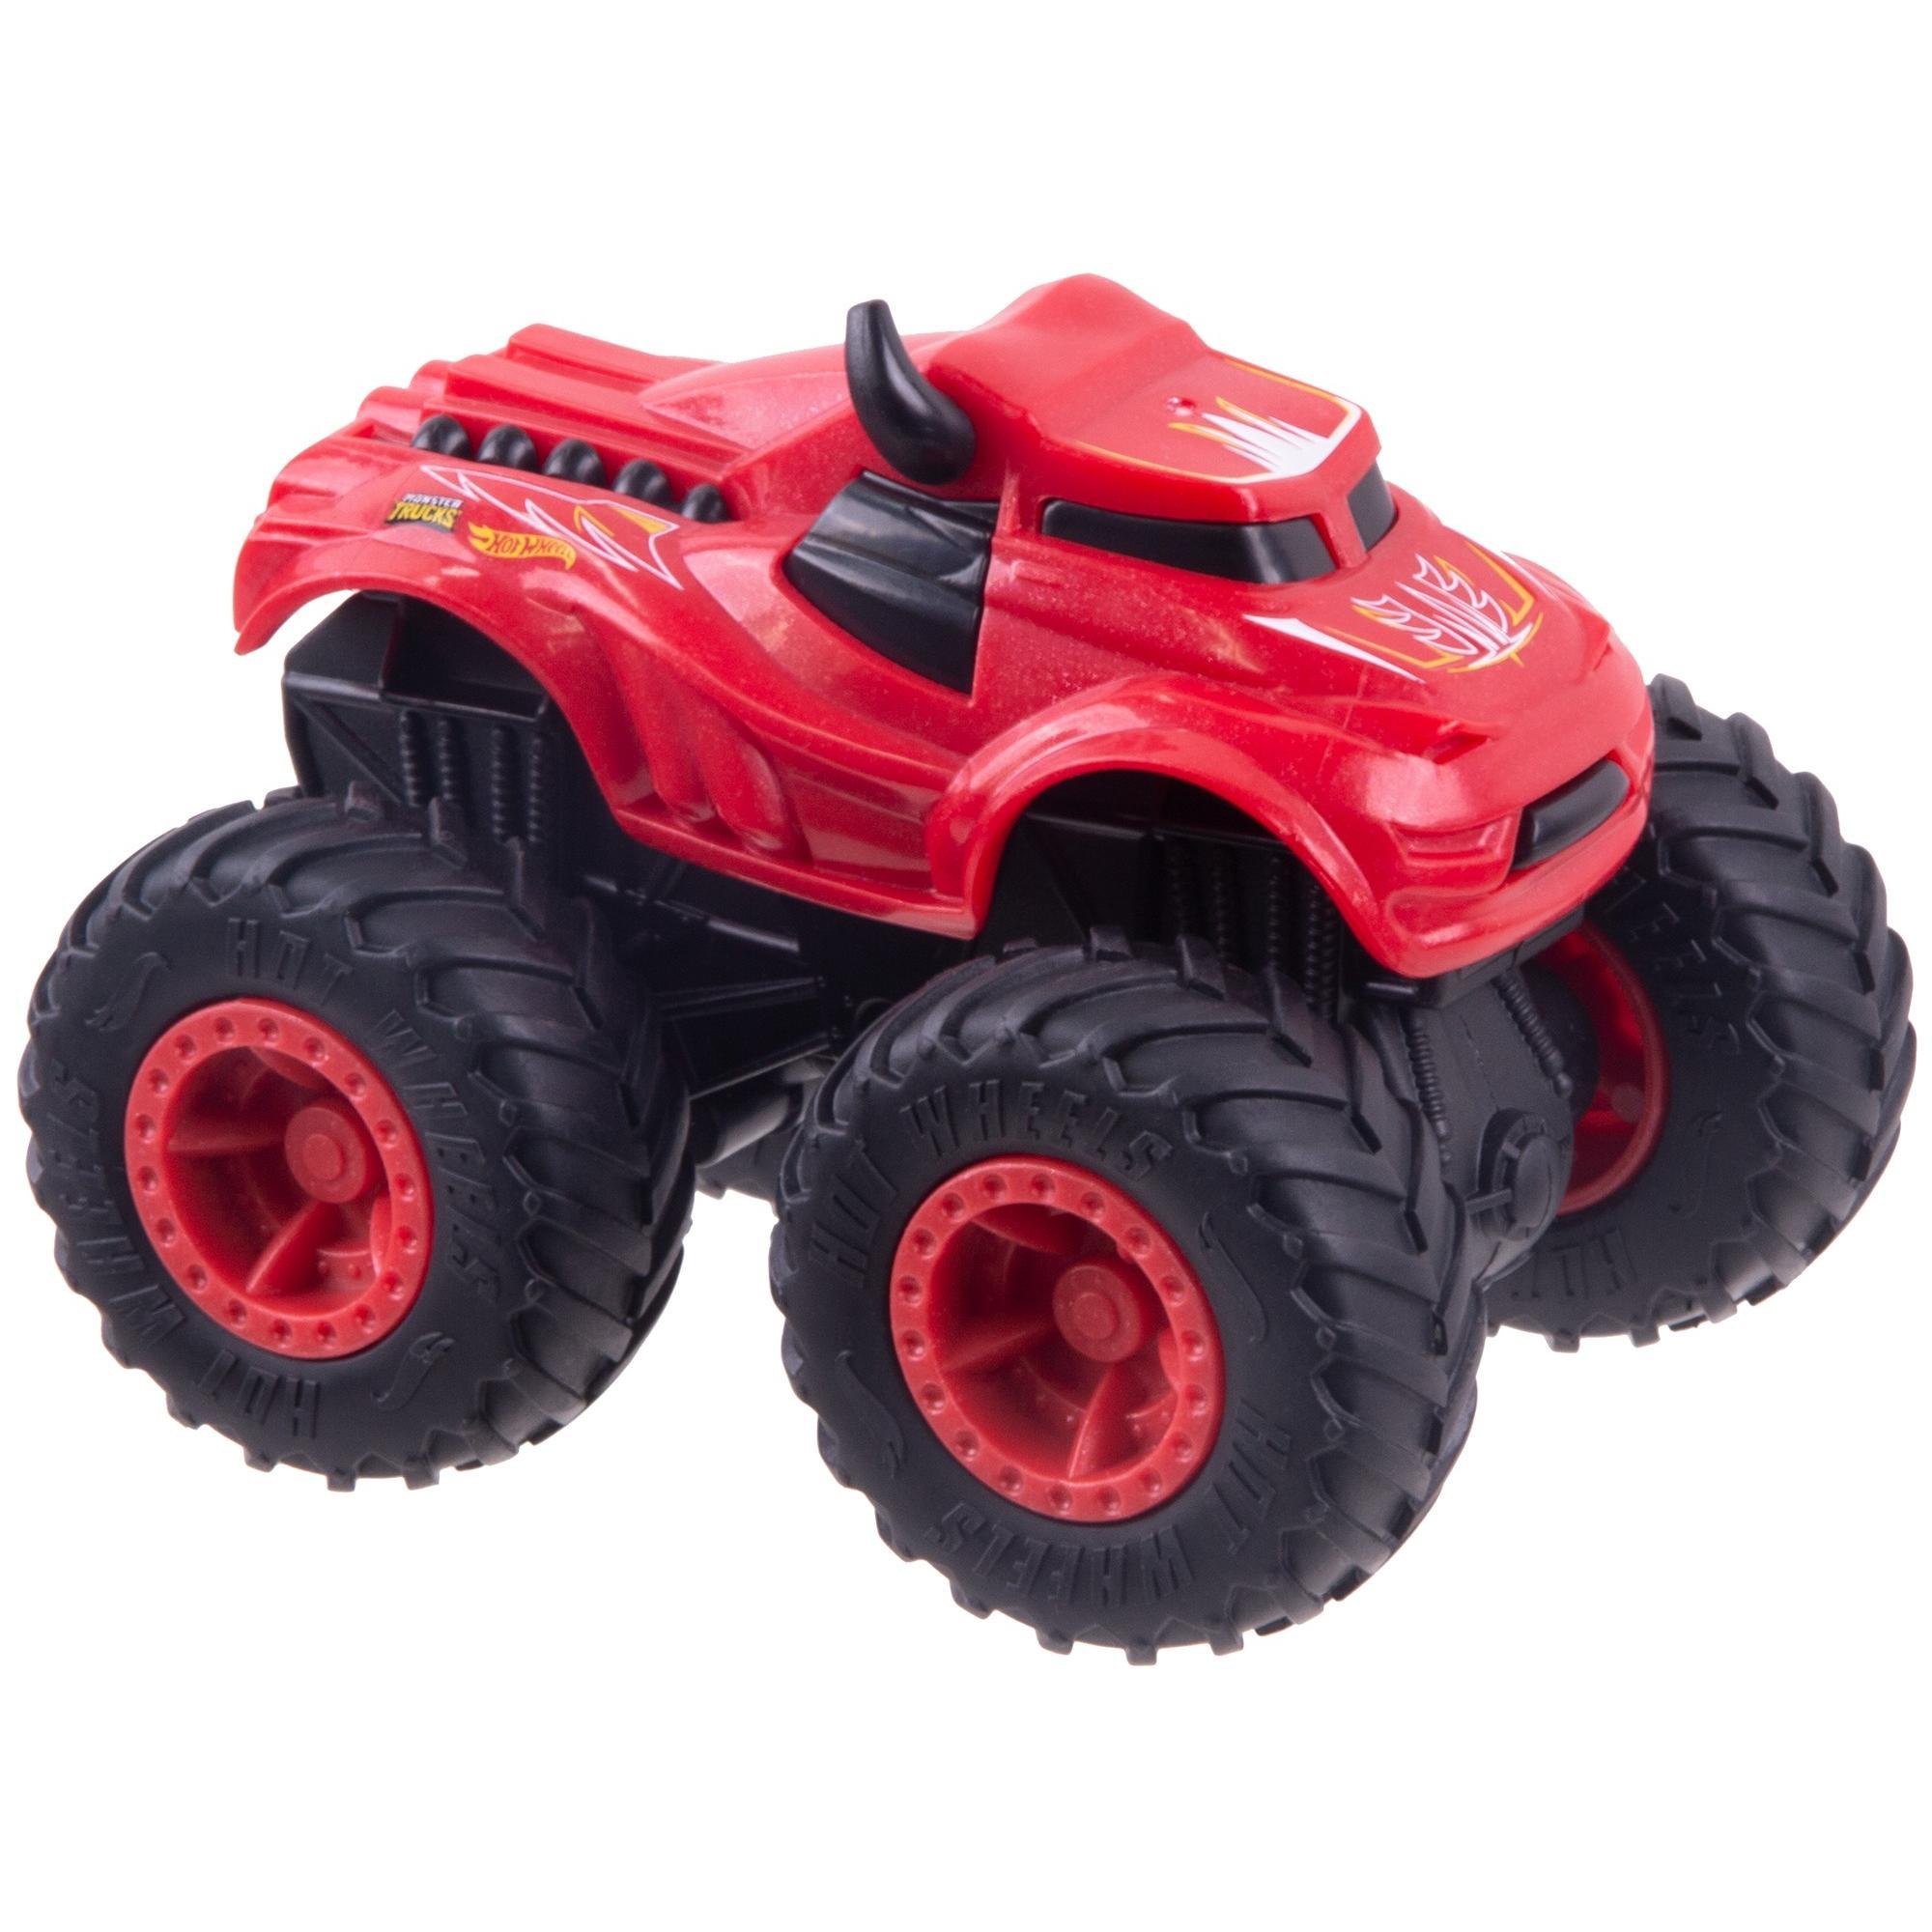 Hot Wheels Monster Trucks 1:43 Scale Steer Clear